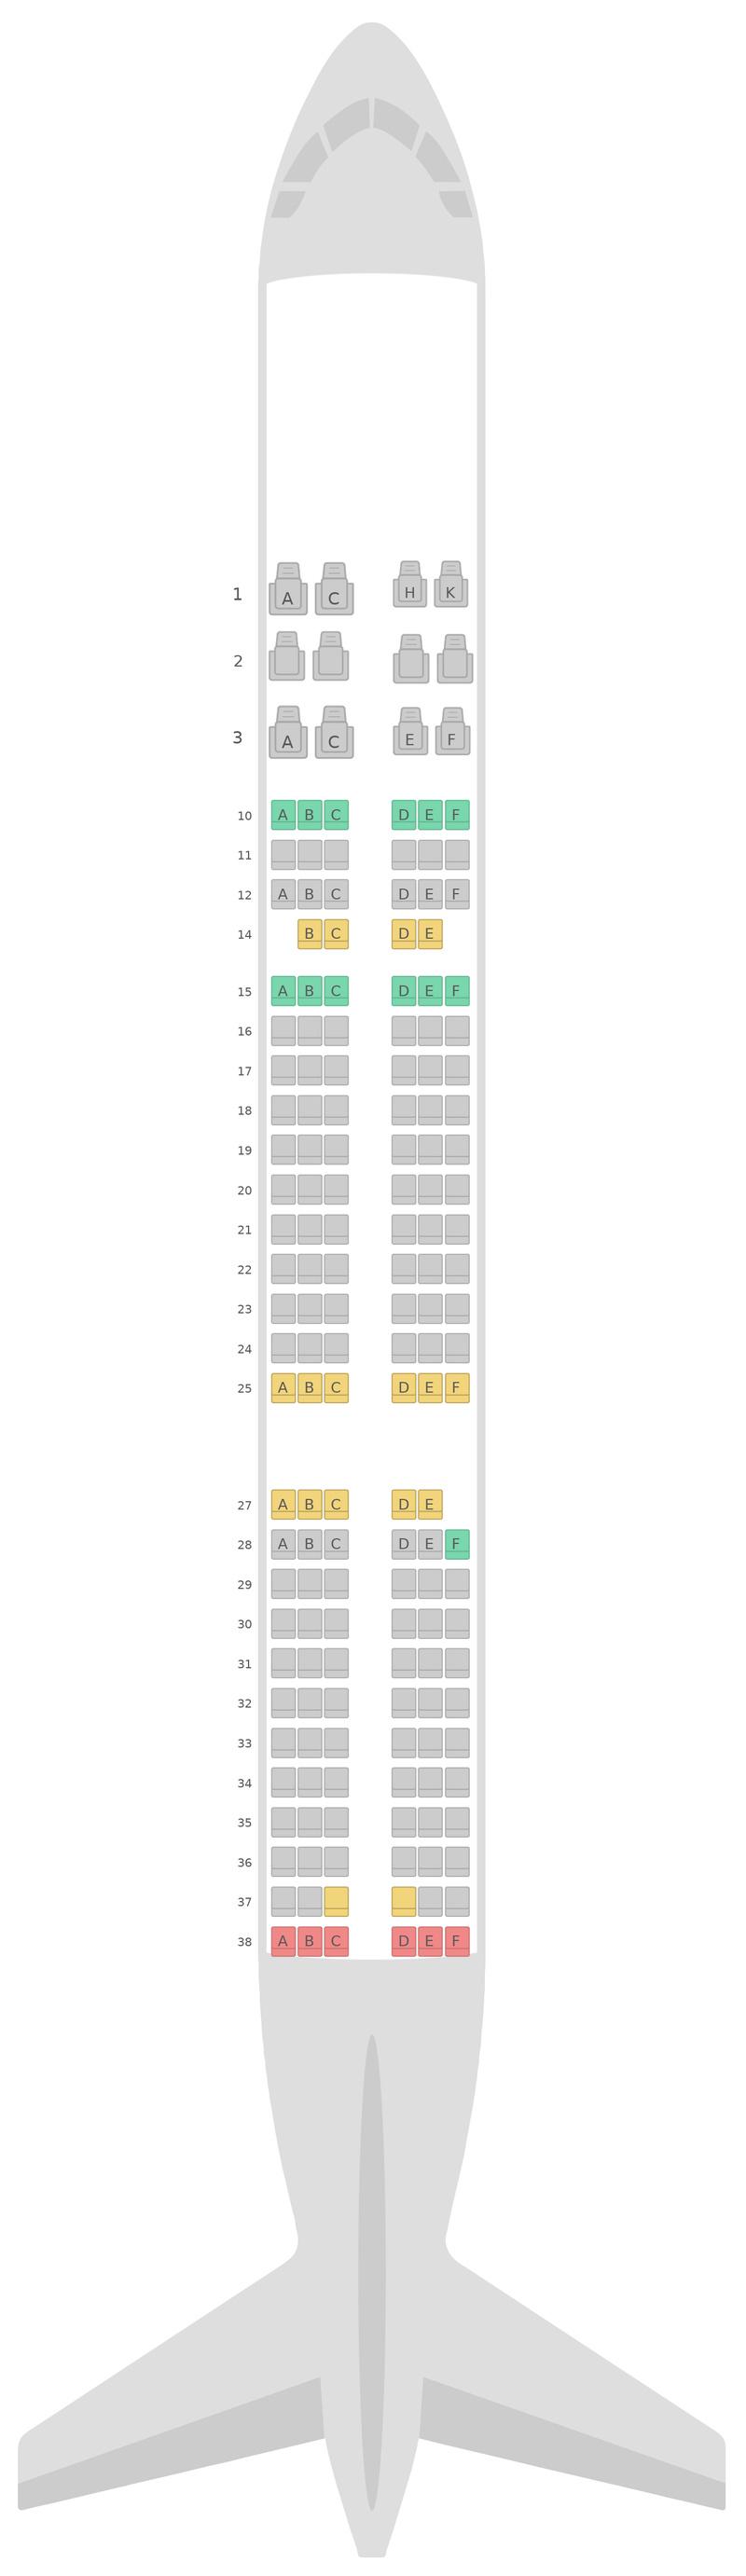 Схема салона Аэробус А321 2 Class v1 Asiana Airlines